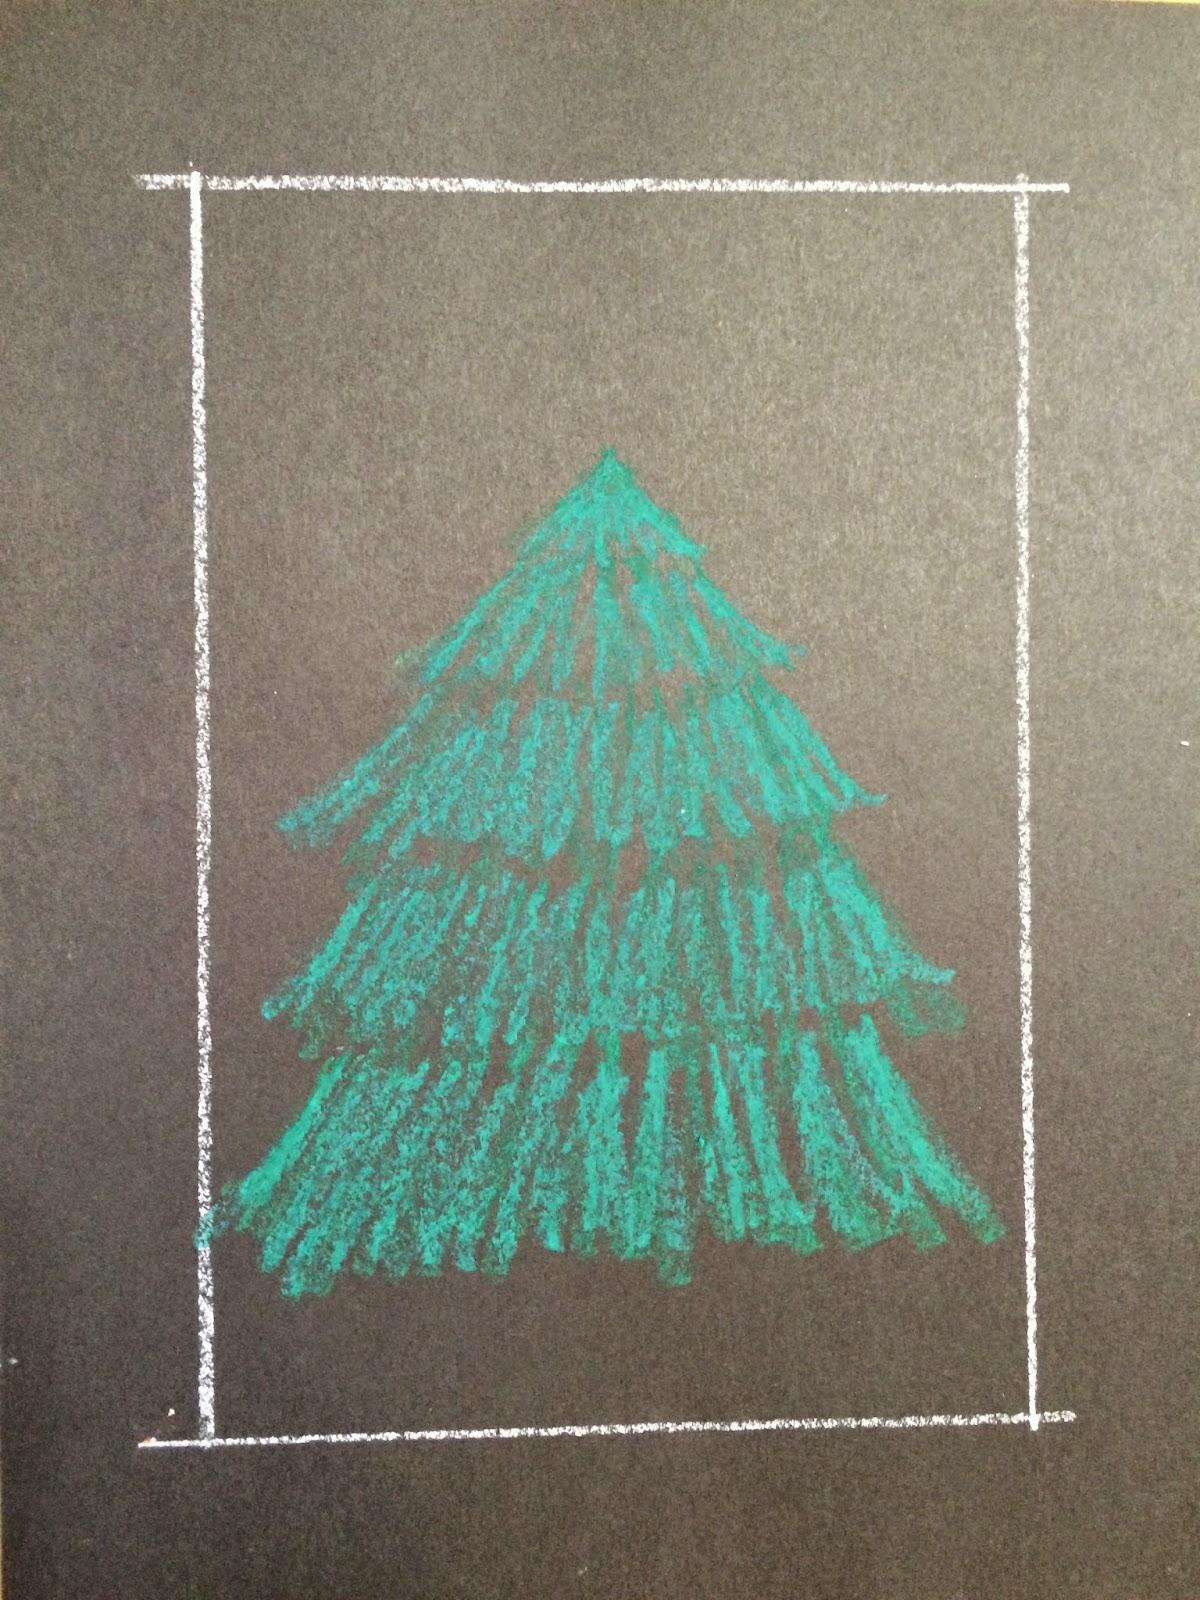 kathys angelnik designs art project ideas - Christmas Tree Art